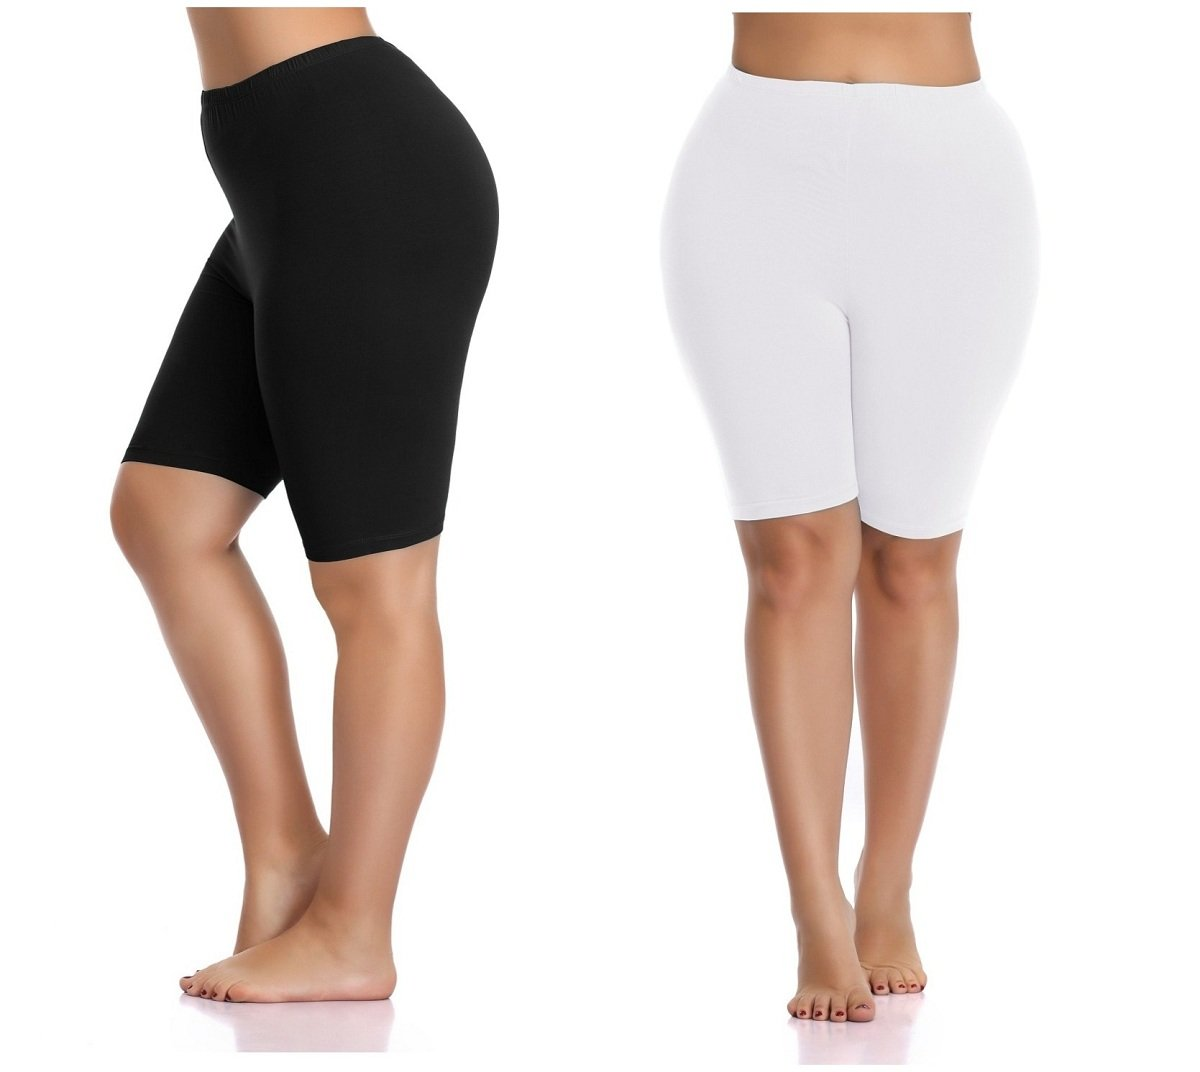 Kotii Women's Plus Size Short Leggings Cotton Shorts Under Dresses Leggings Pants,1Pack